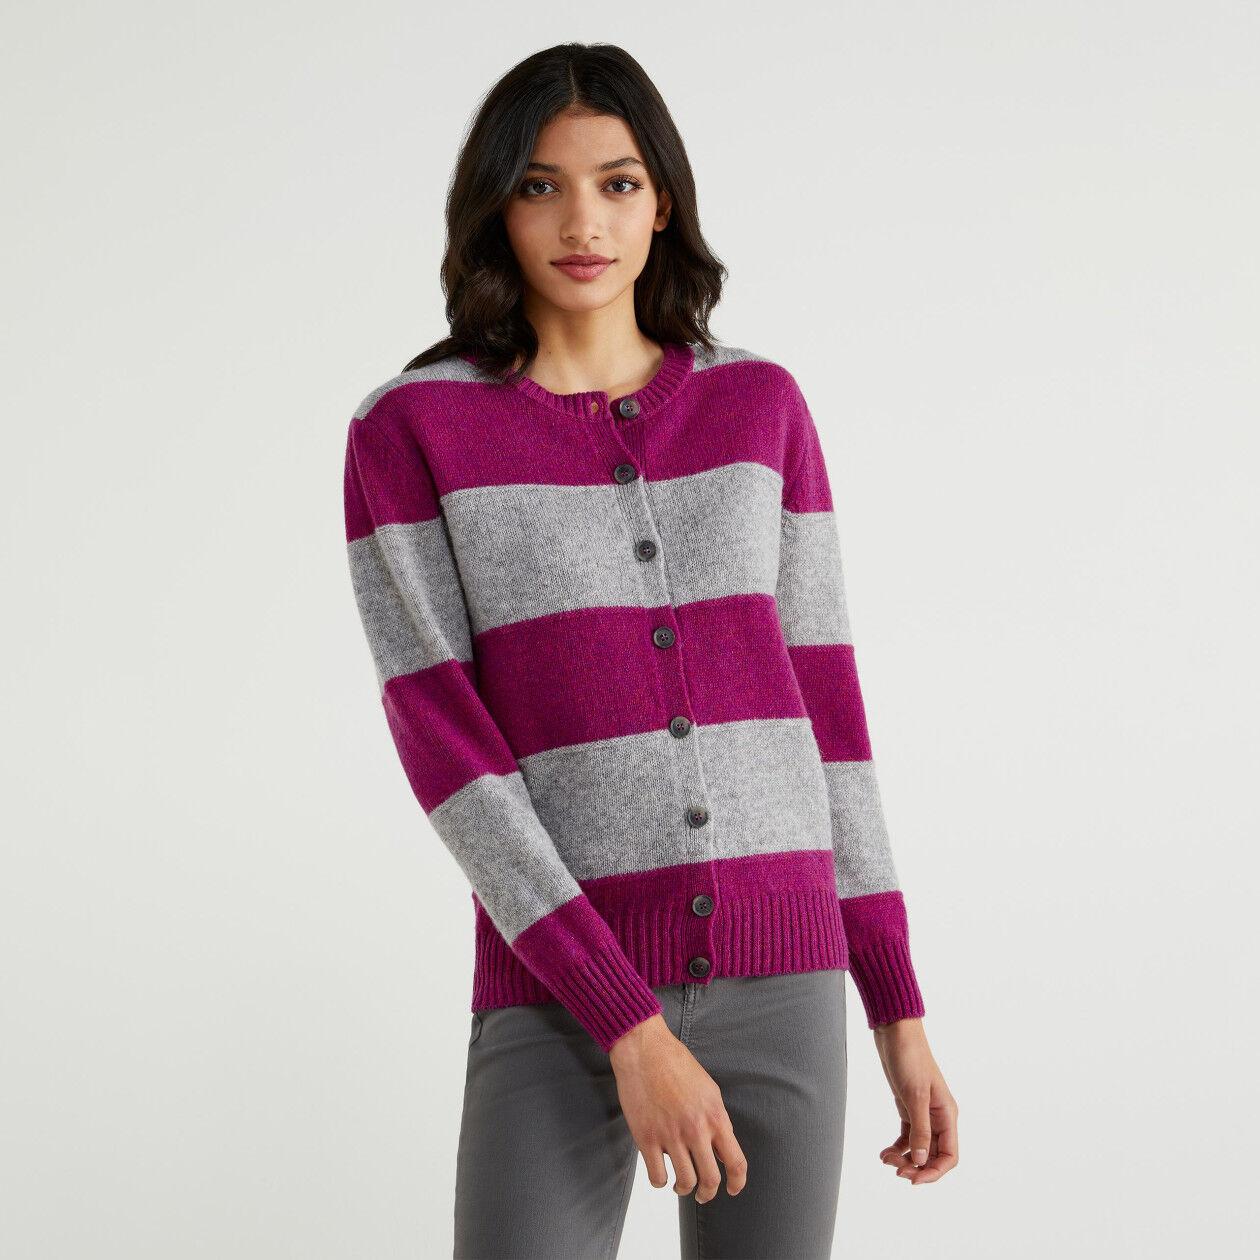 Cardigan in Shetland wool